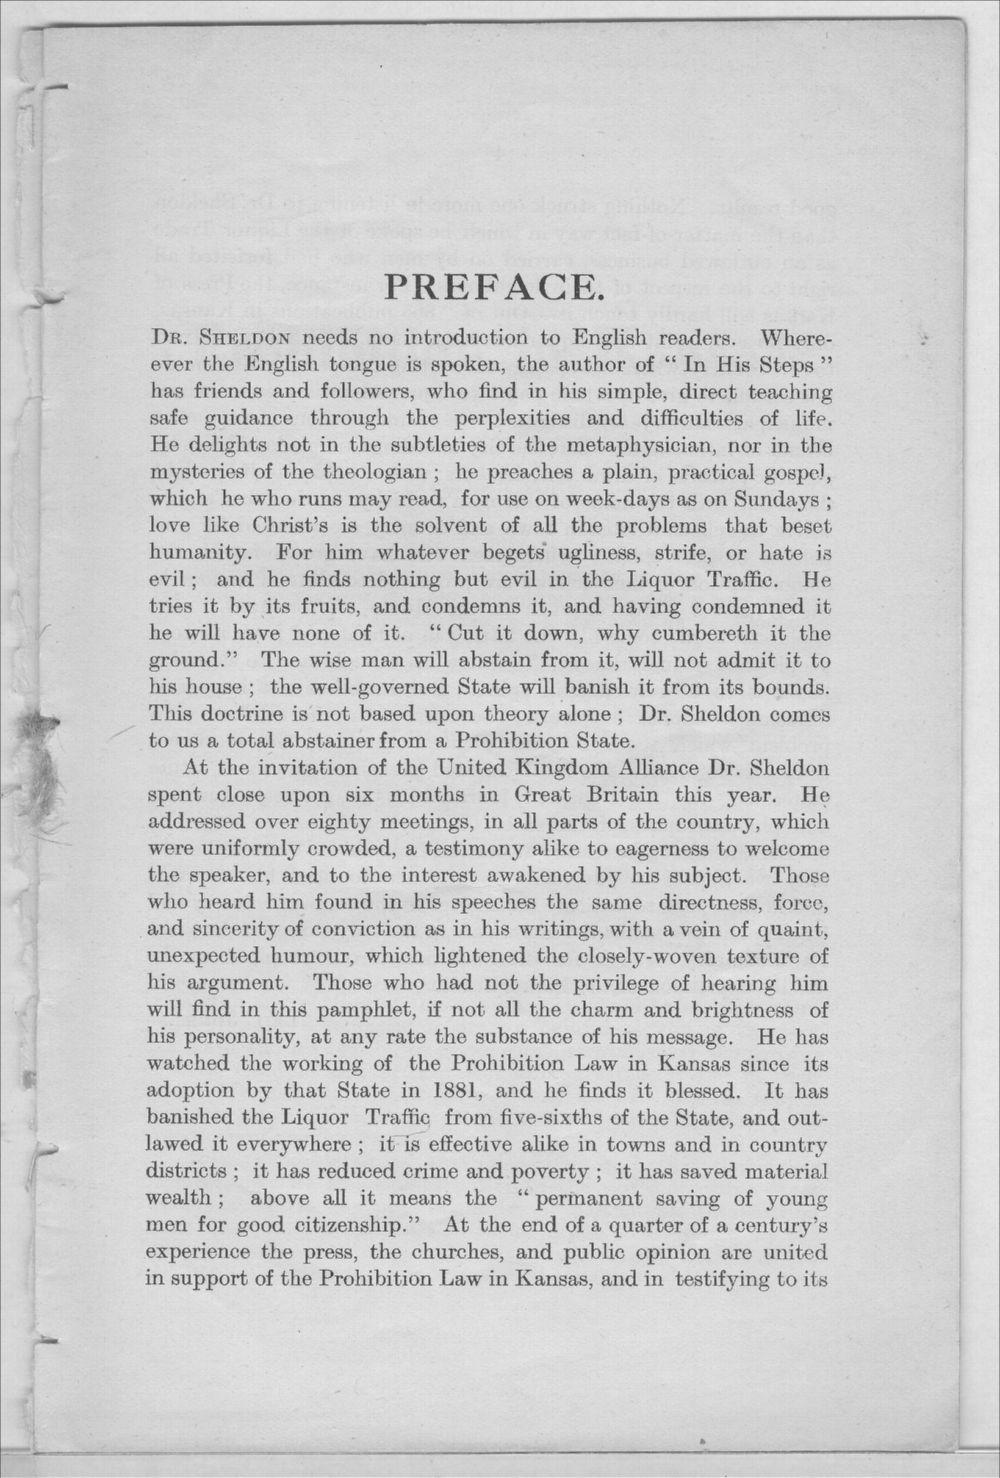 Prohibition in Kansas, U.S.A. - Preface